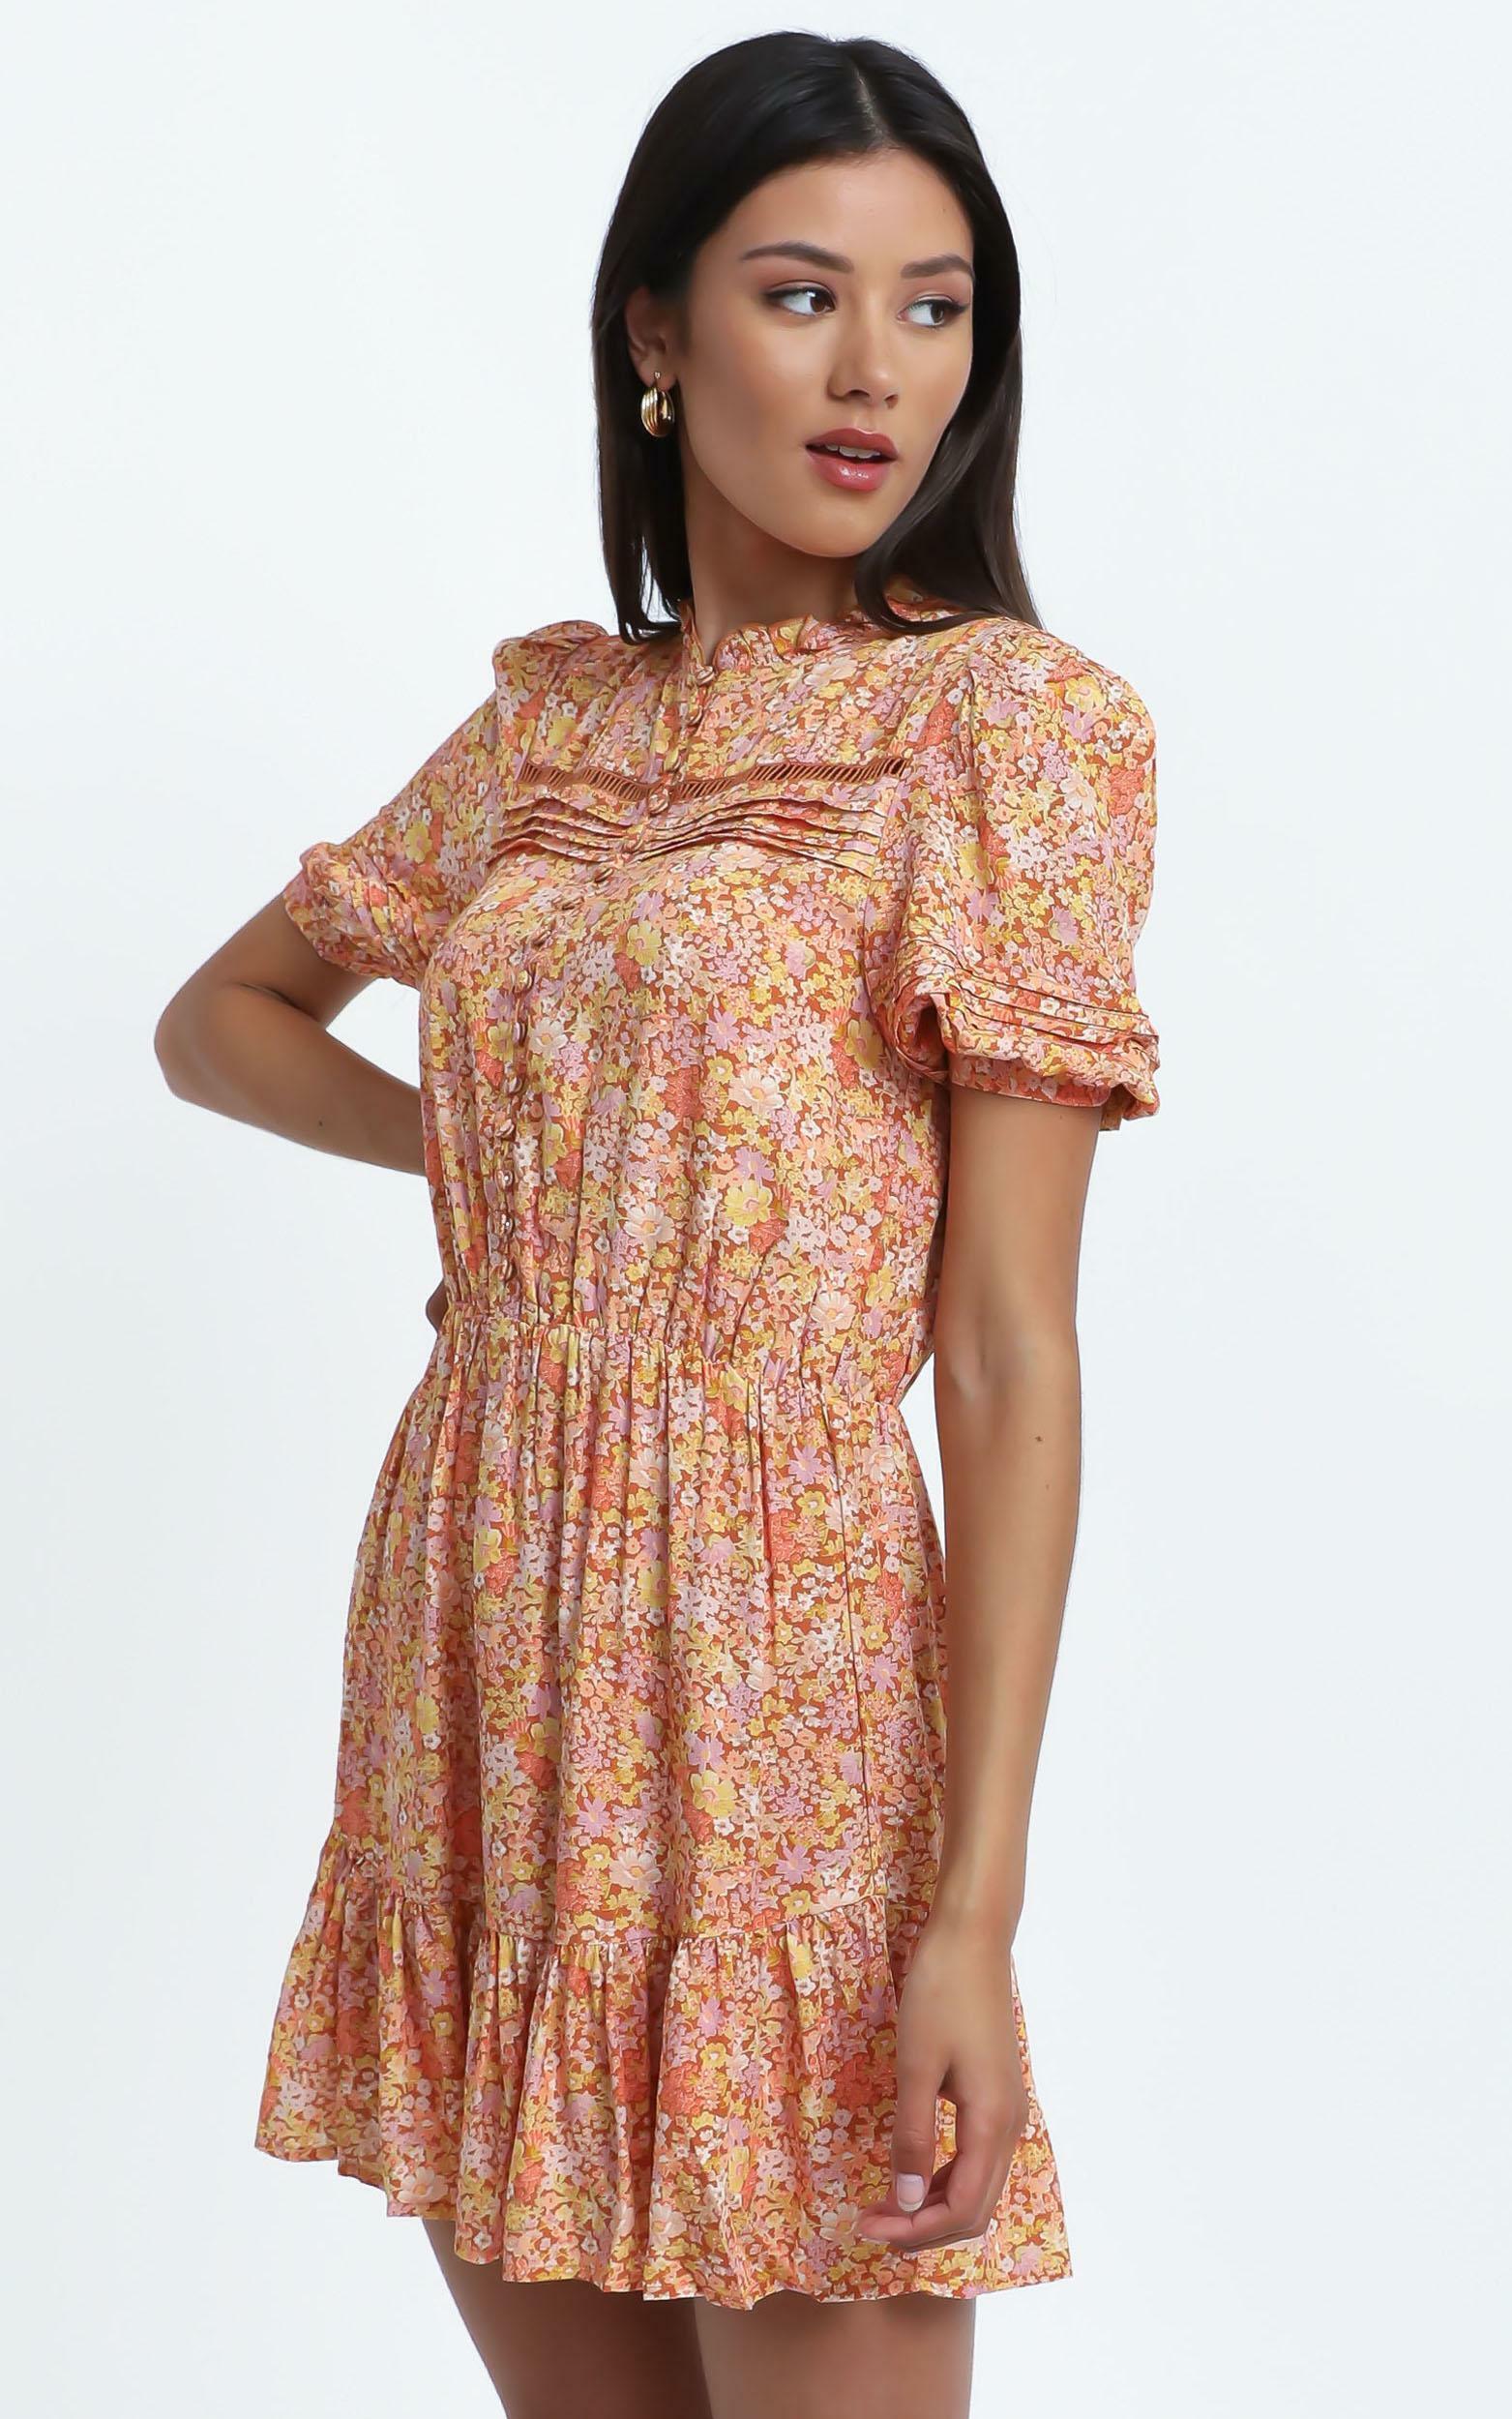 Mahalia Dress in Blushing Floral - 14 (XL), Orange, hi-res image number null